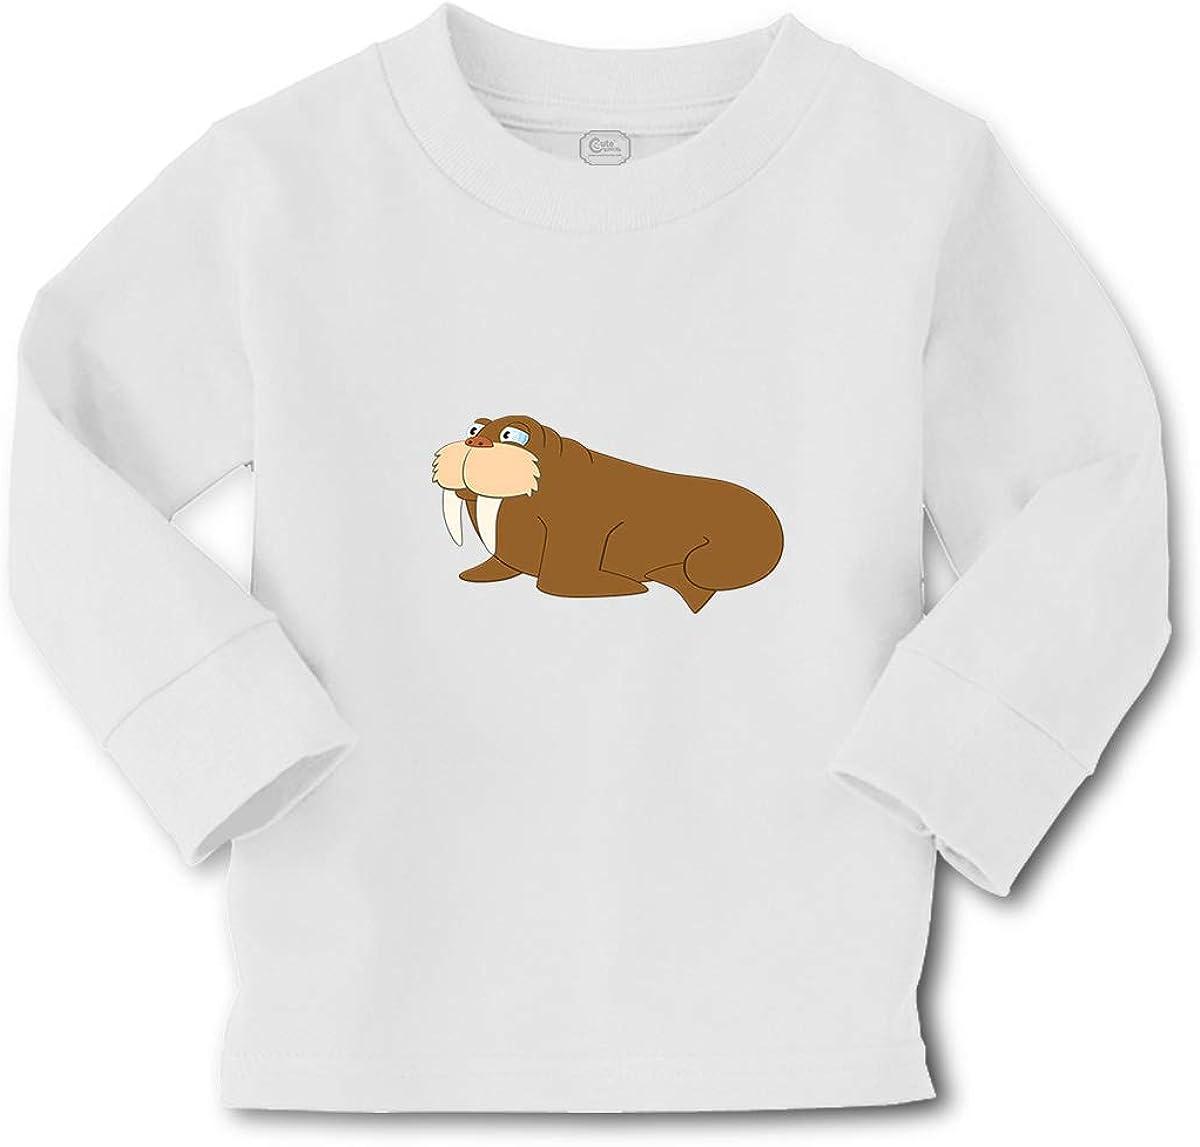 Kids Long Sleeve T Shirt Walrus Ocean Sea Life Cotton Boy & Girl Clothes